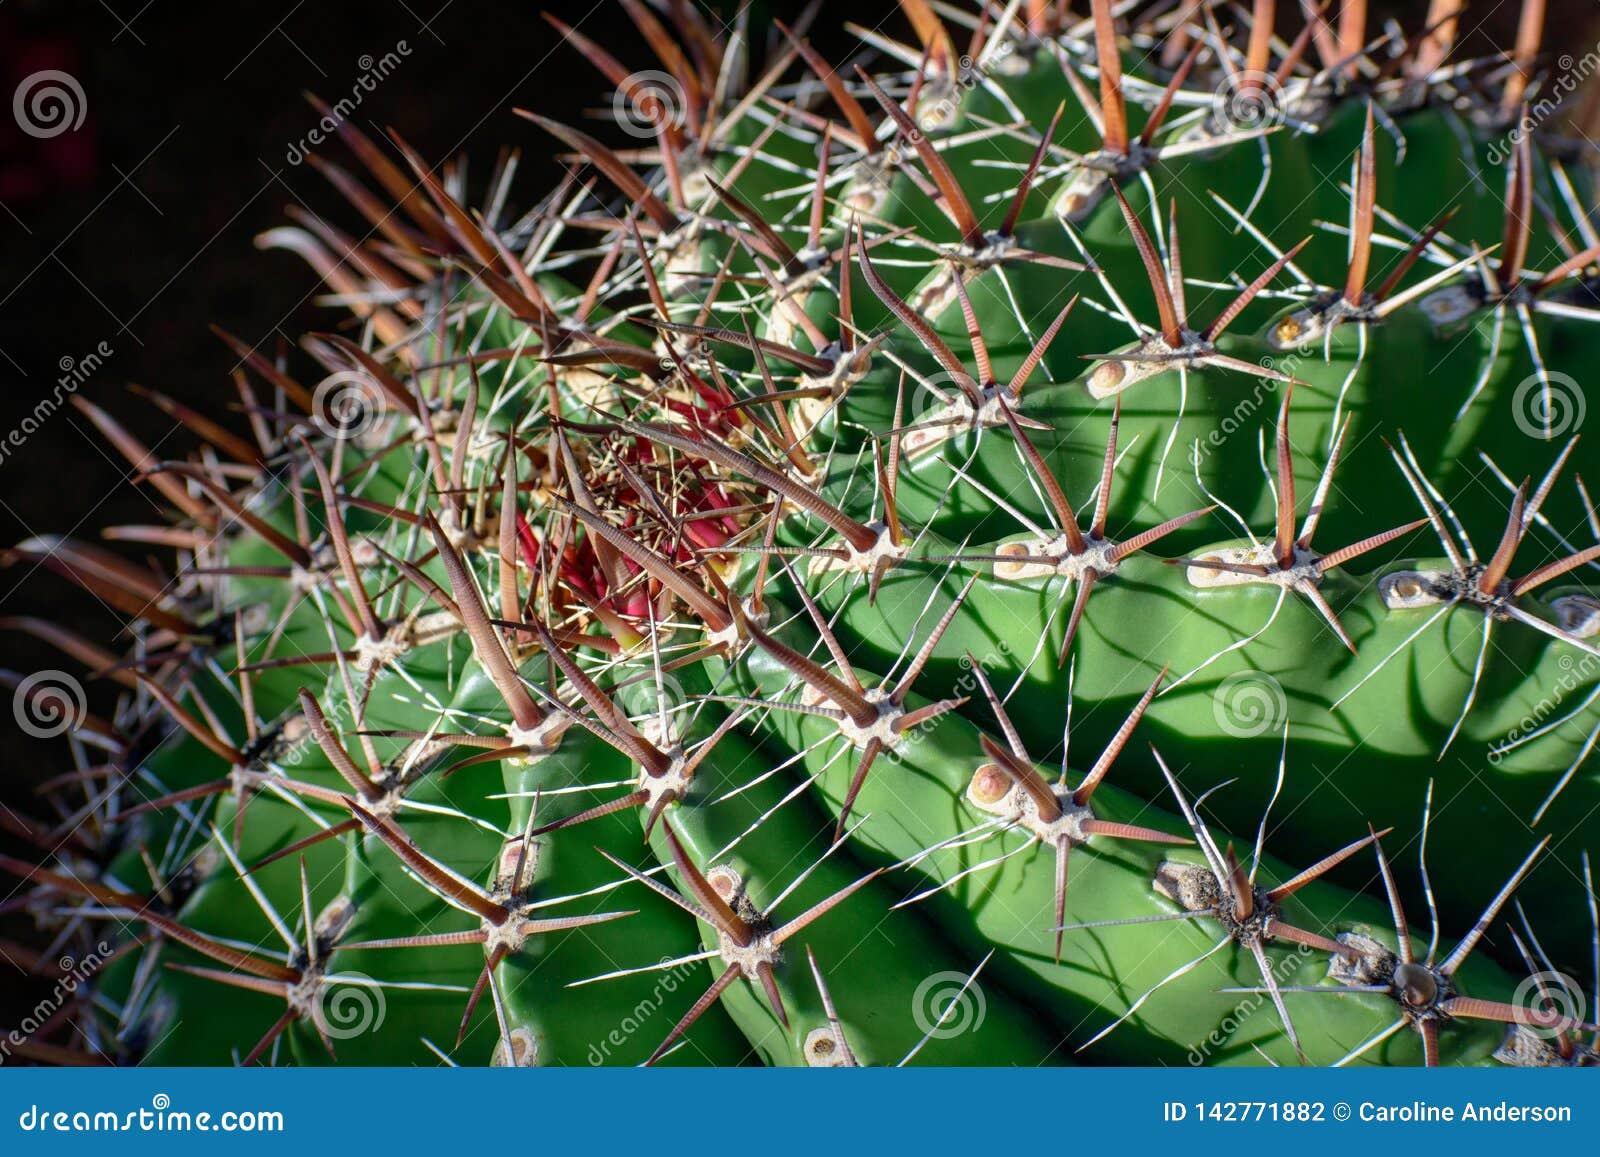 Großer runder Kaktus, Abschluss oben, selektive Ansicht